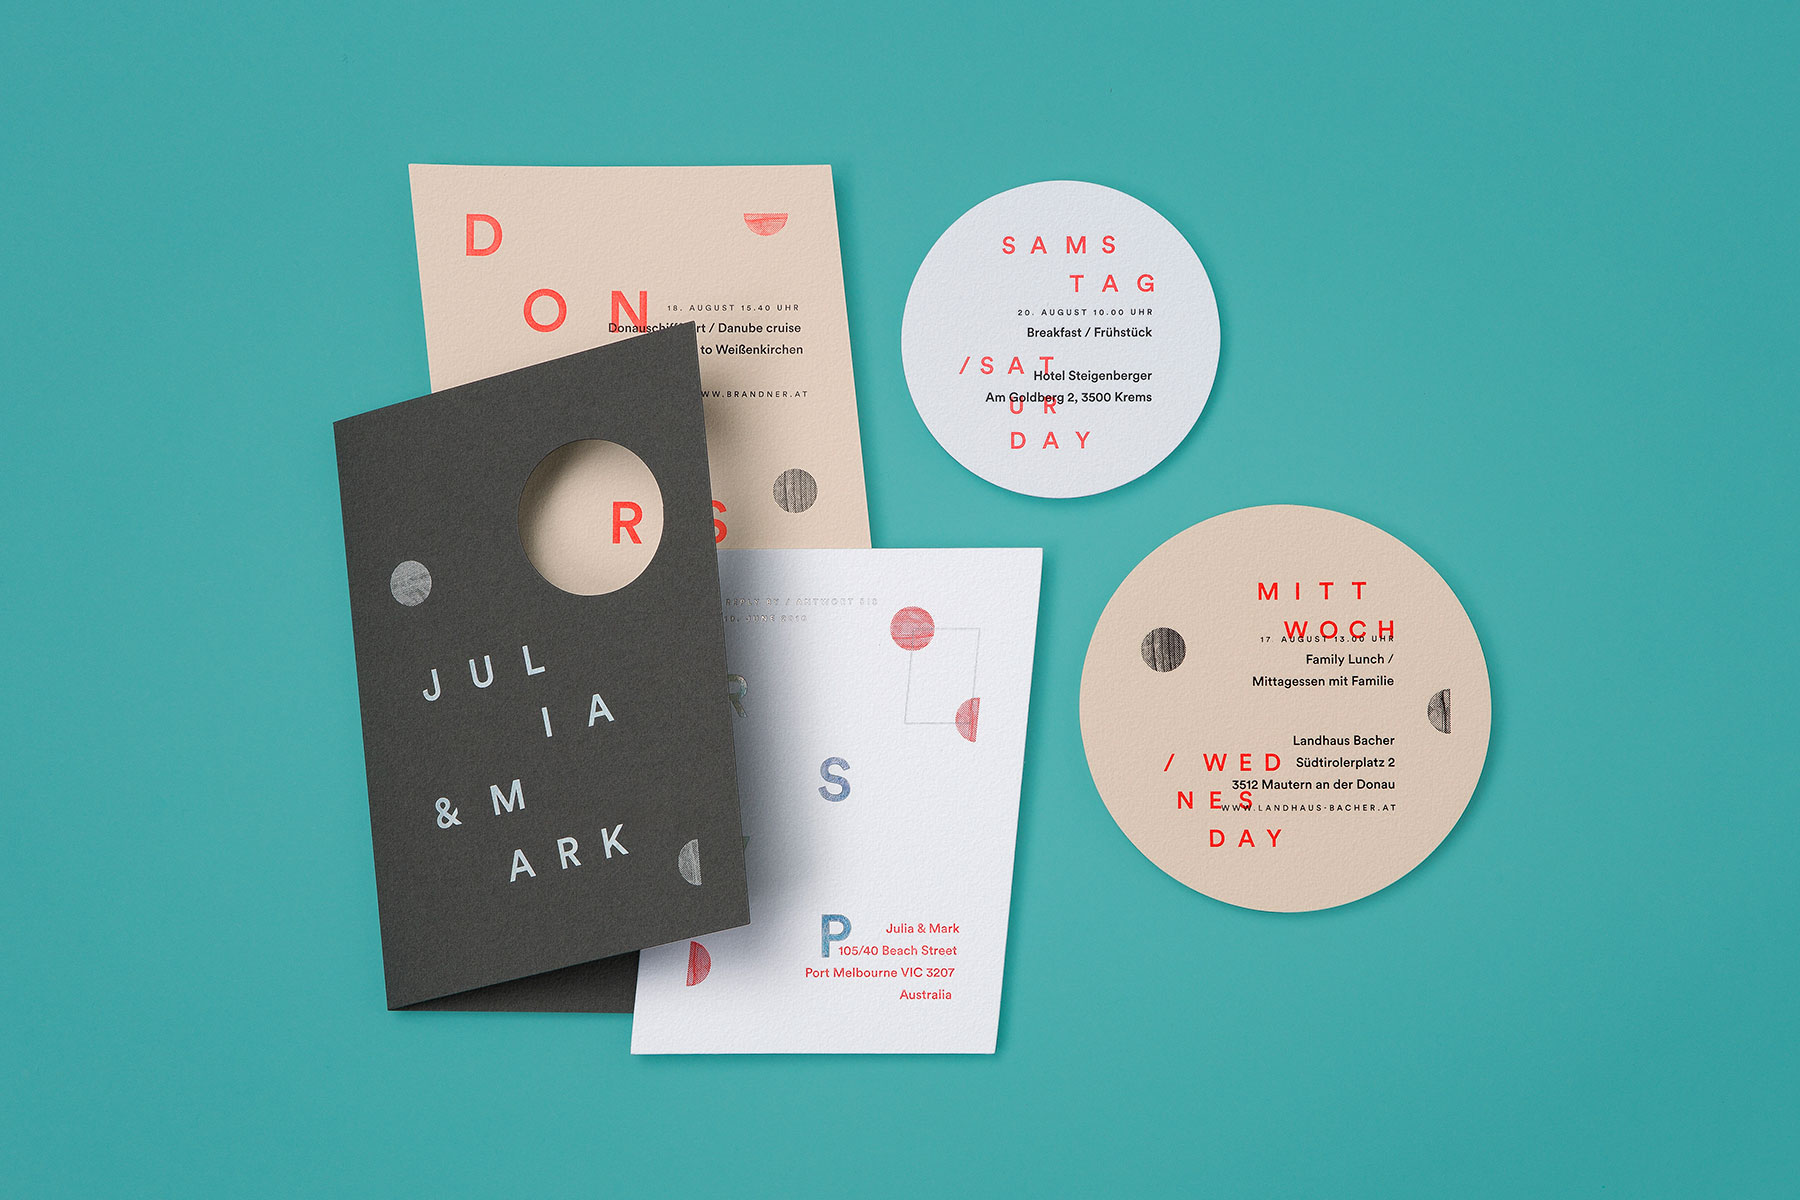 Modern minimalist letterpress wedding invitations for Julia and Mark on Colorplan 4